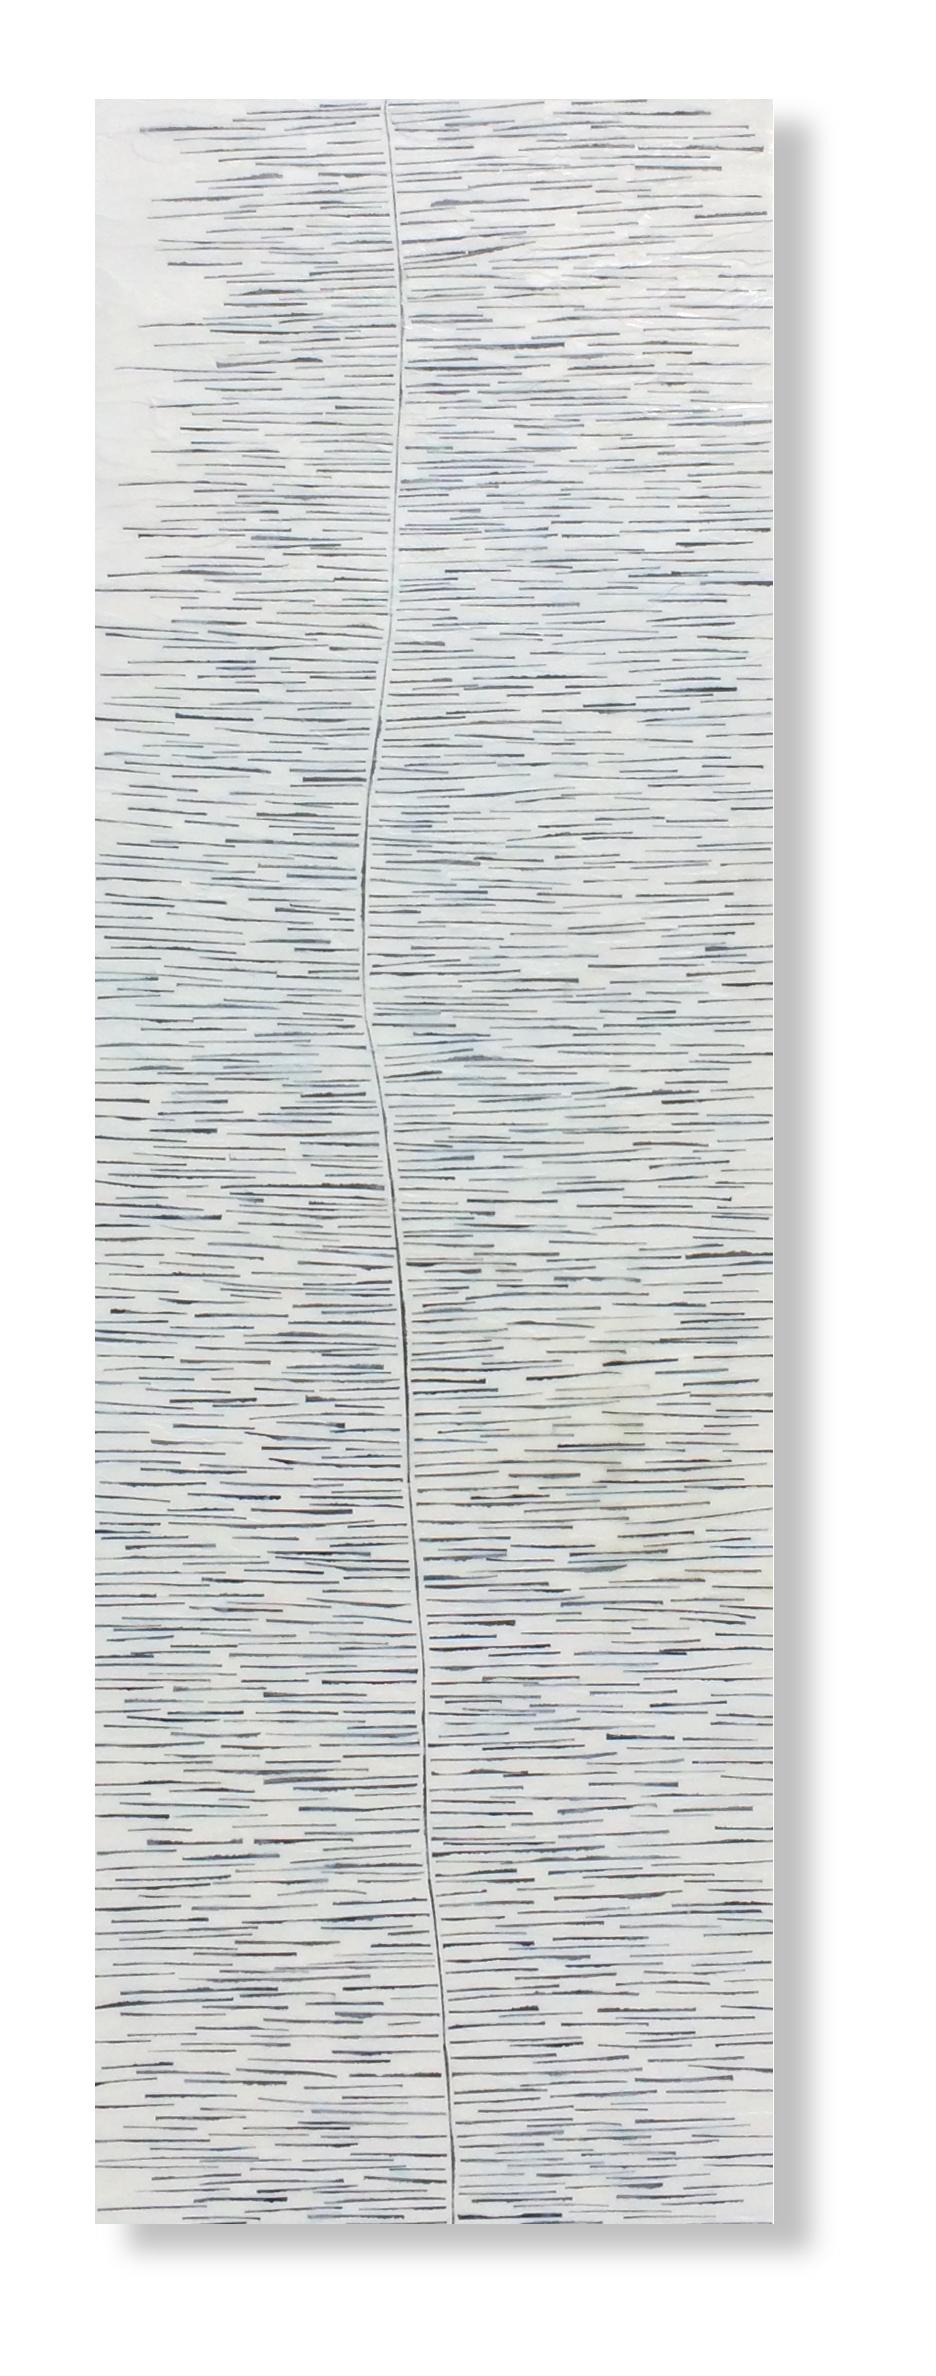 "Tidal Shift, 2016 Encaustic, Mulberry Paper, Watercolor 12"" x 36""x .1"" SOLD"